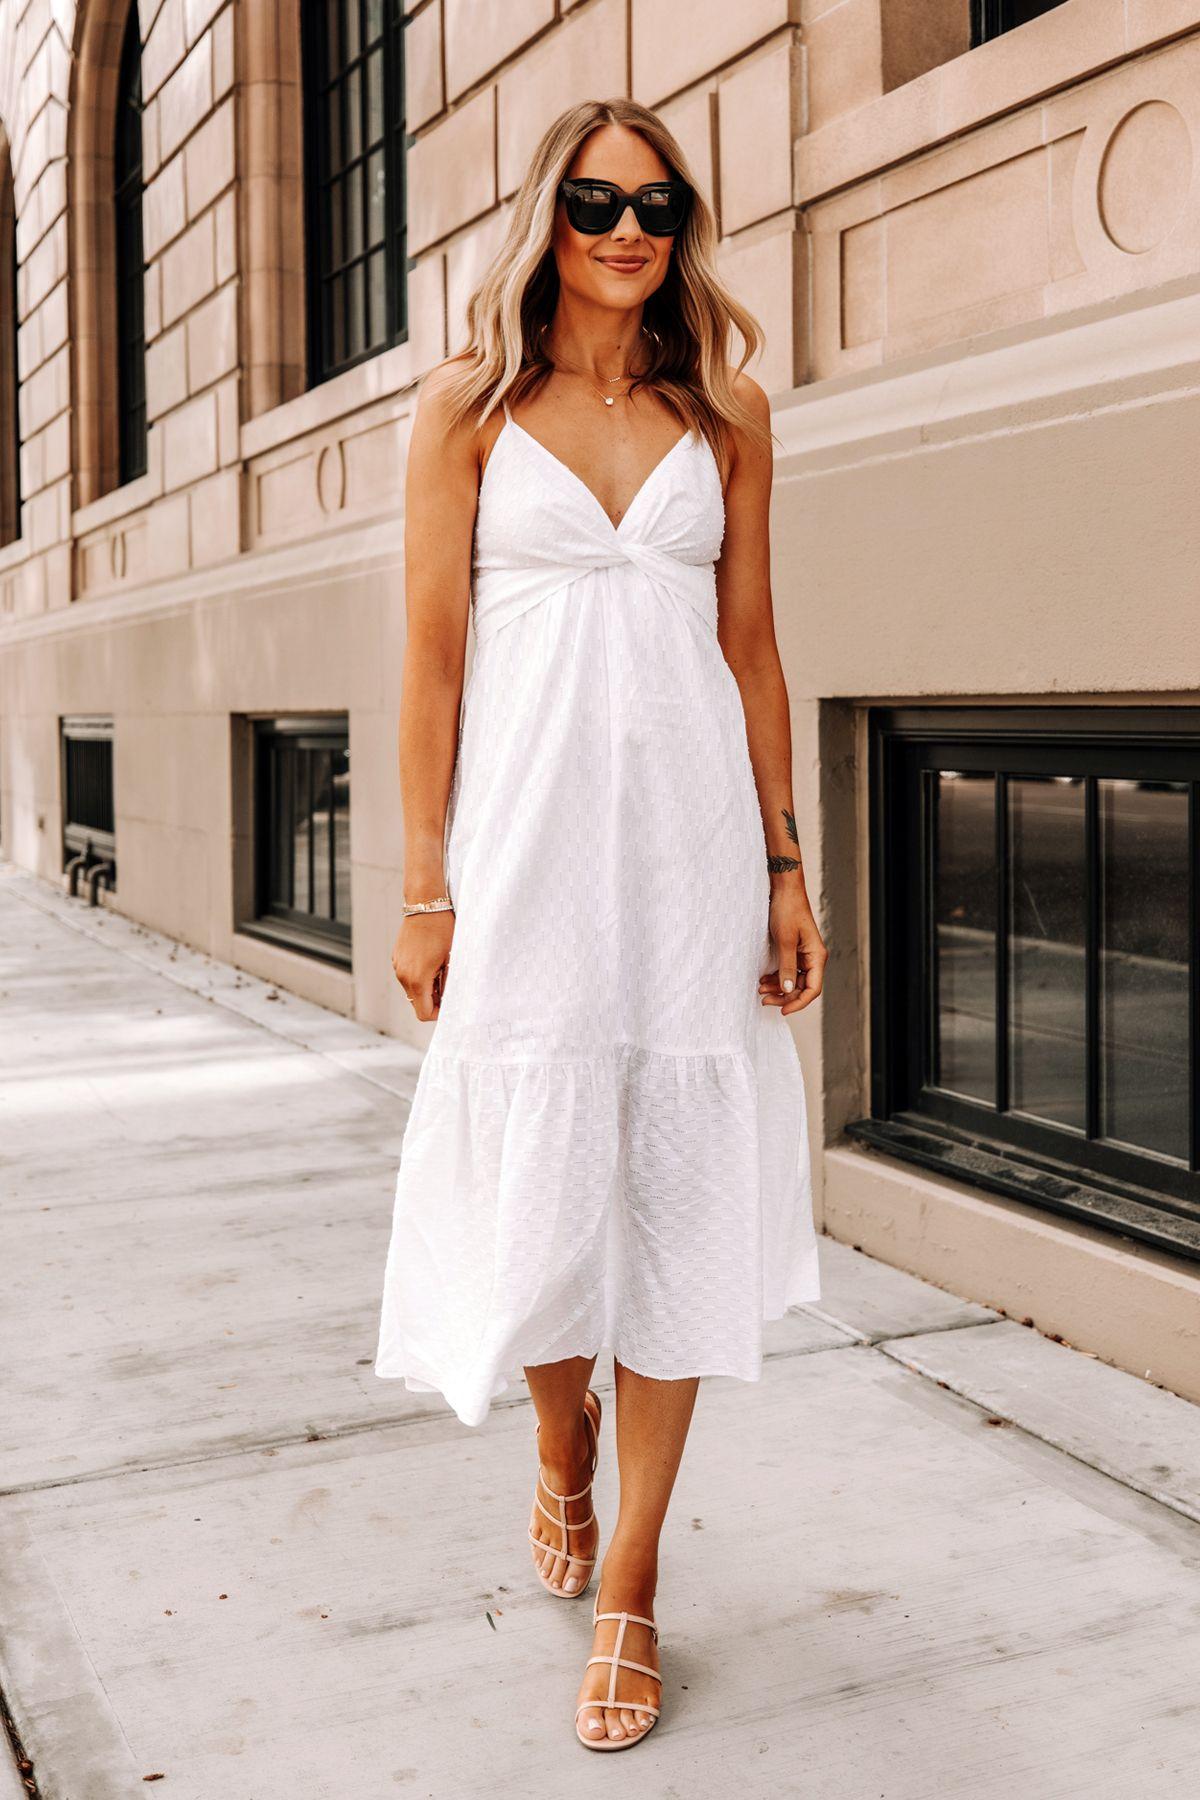 Fashion Jackson Wearing Banana Republic White Midi Dress Tan Sandals White Dress Summer Summer Dresses Fashion Jackson [ 1800 x 1200 Pixel ]